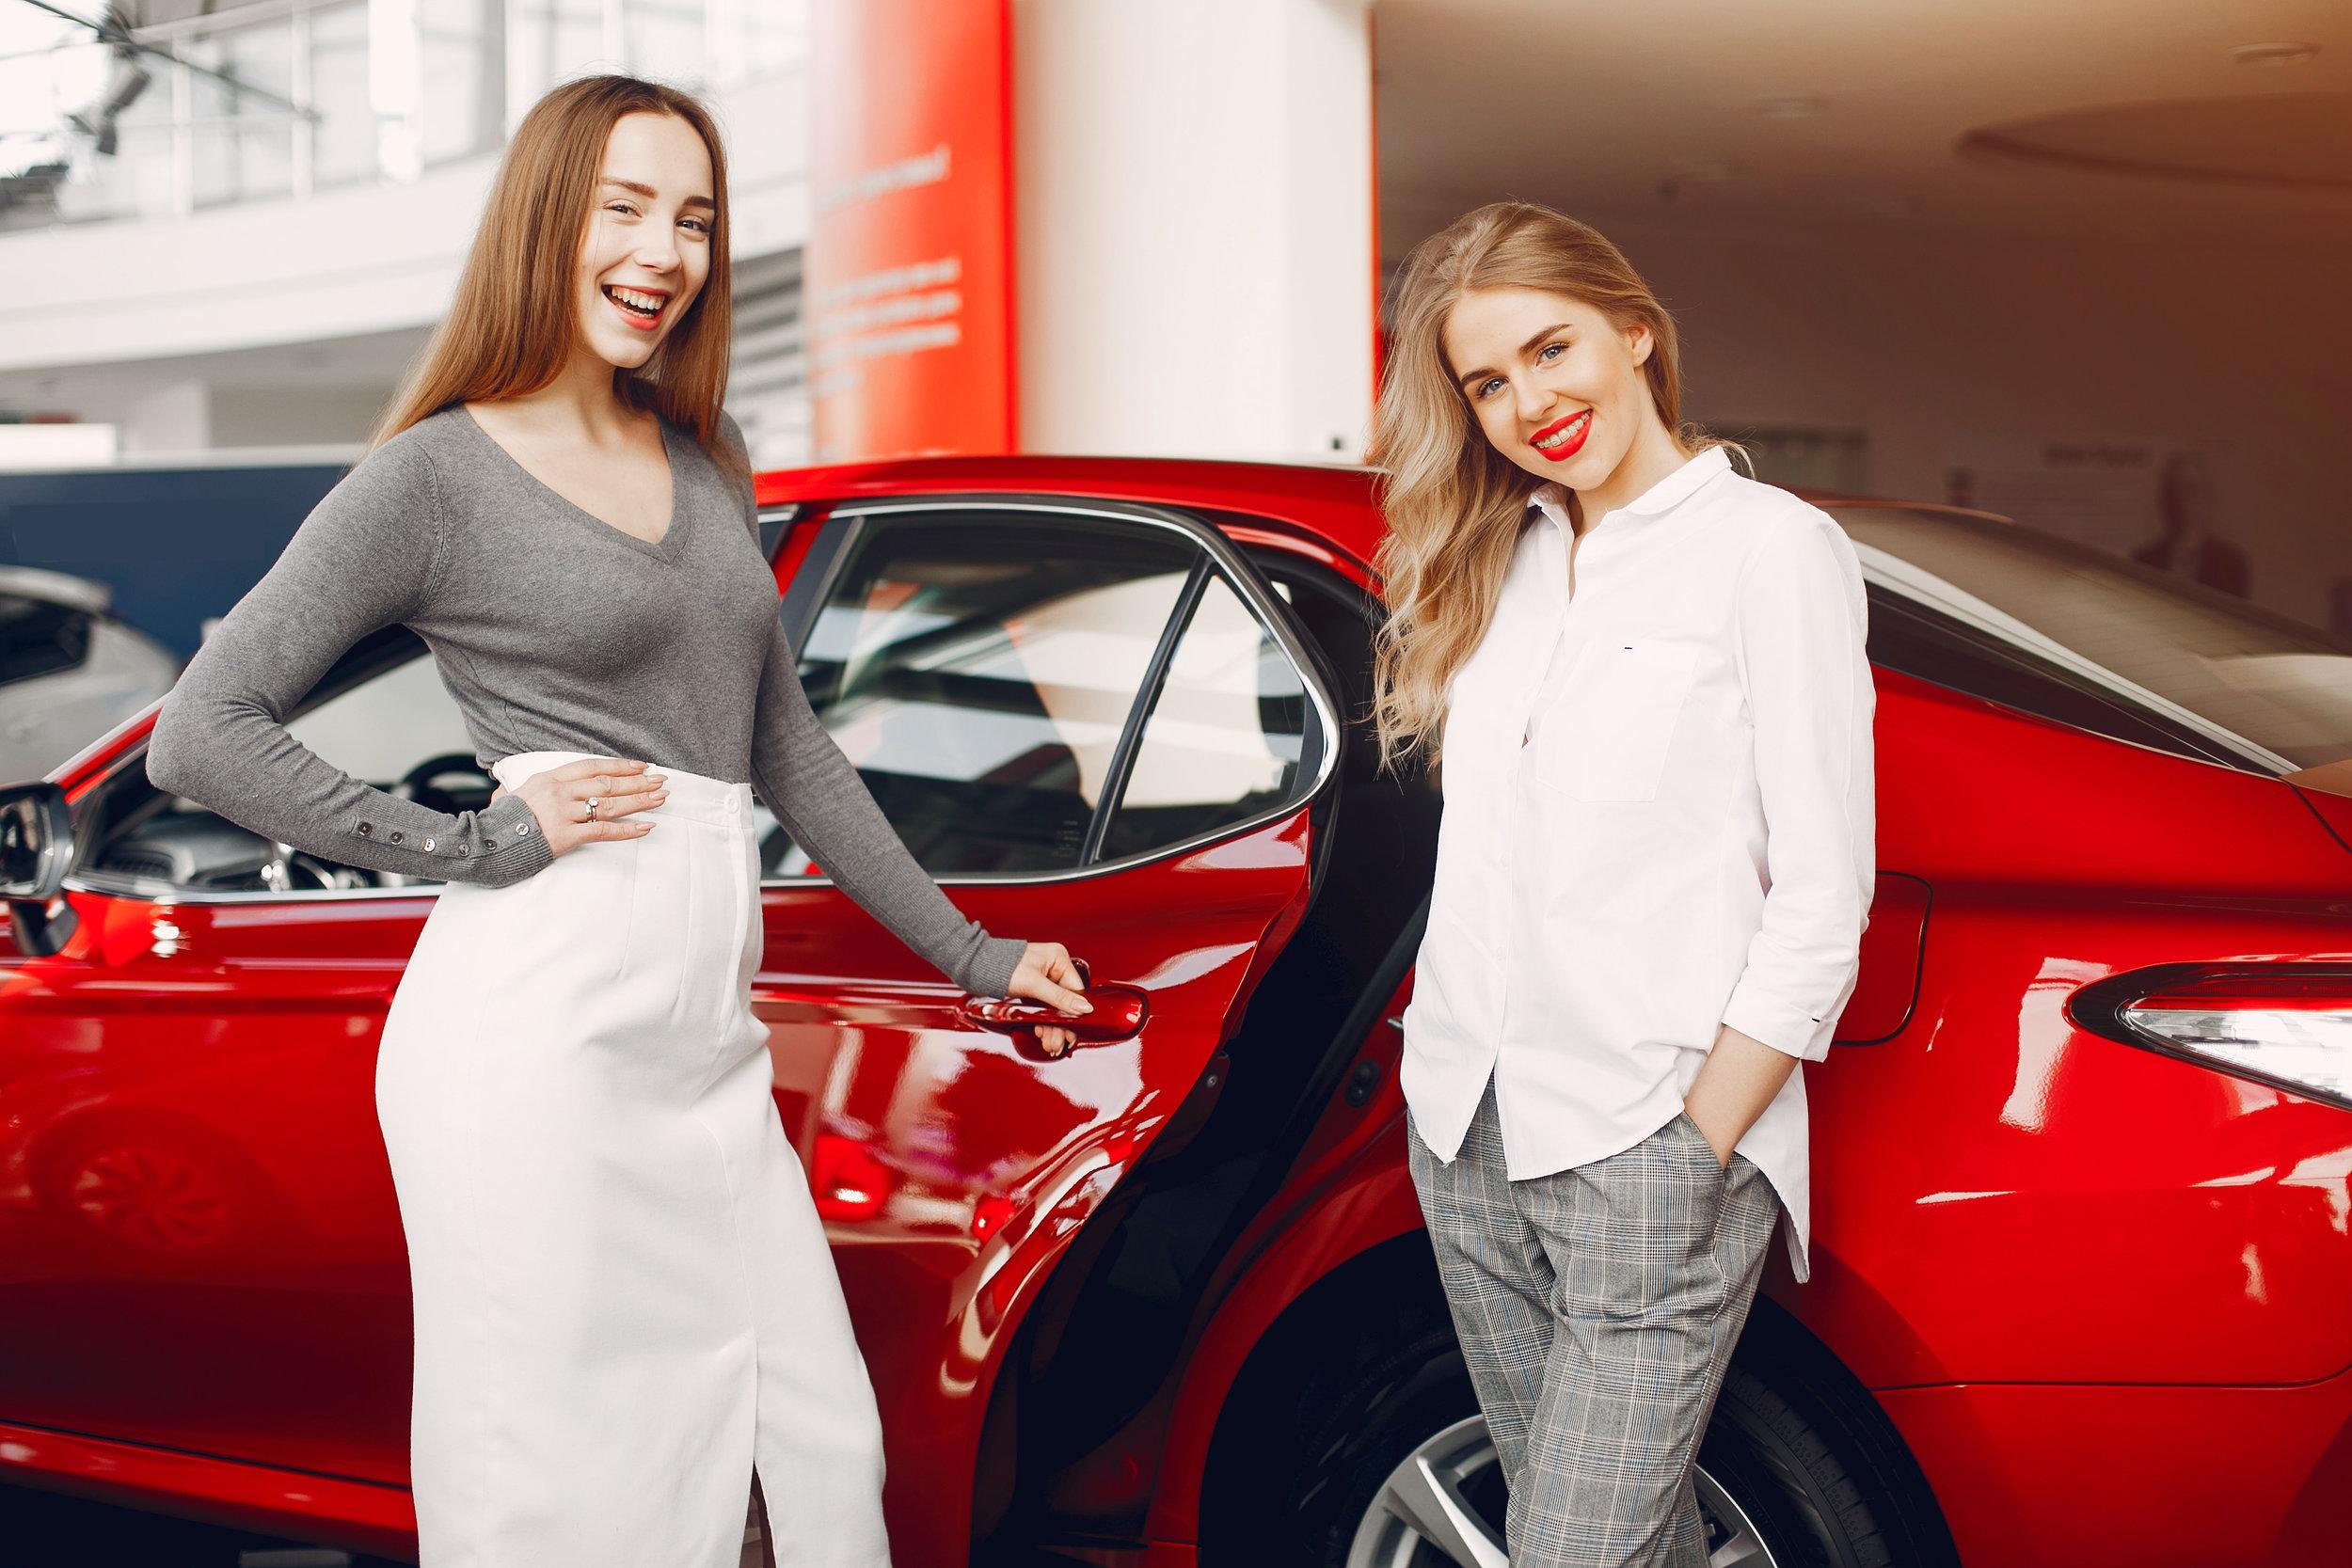 two-stylish-women-in-a-car-salon-GVR964D.jpg